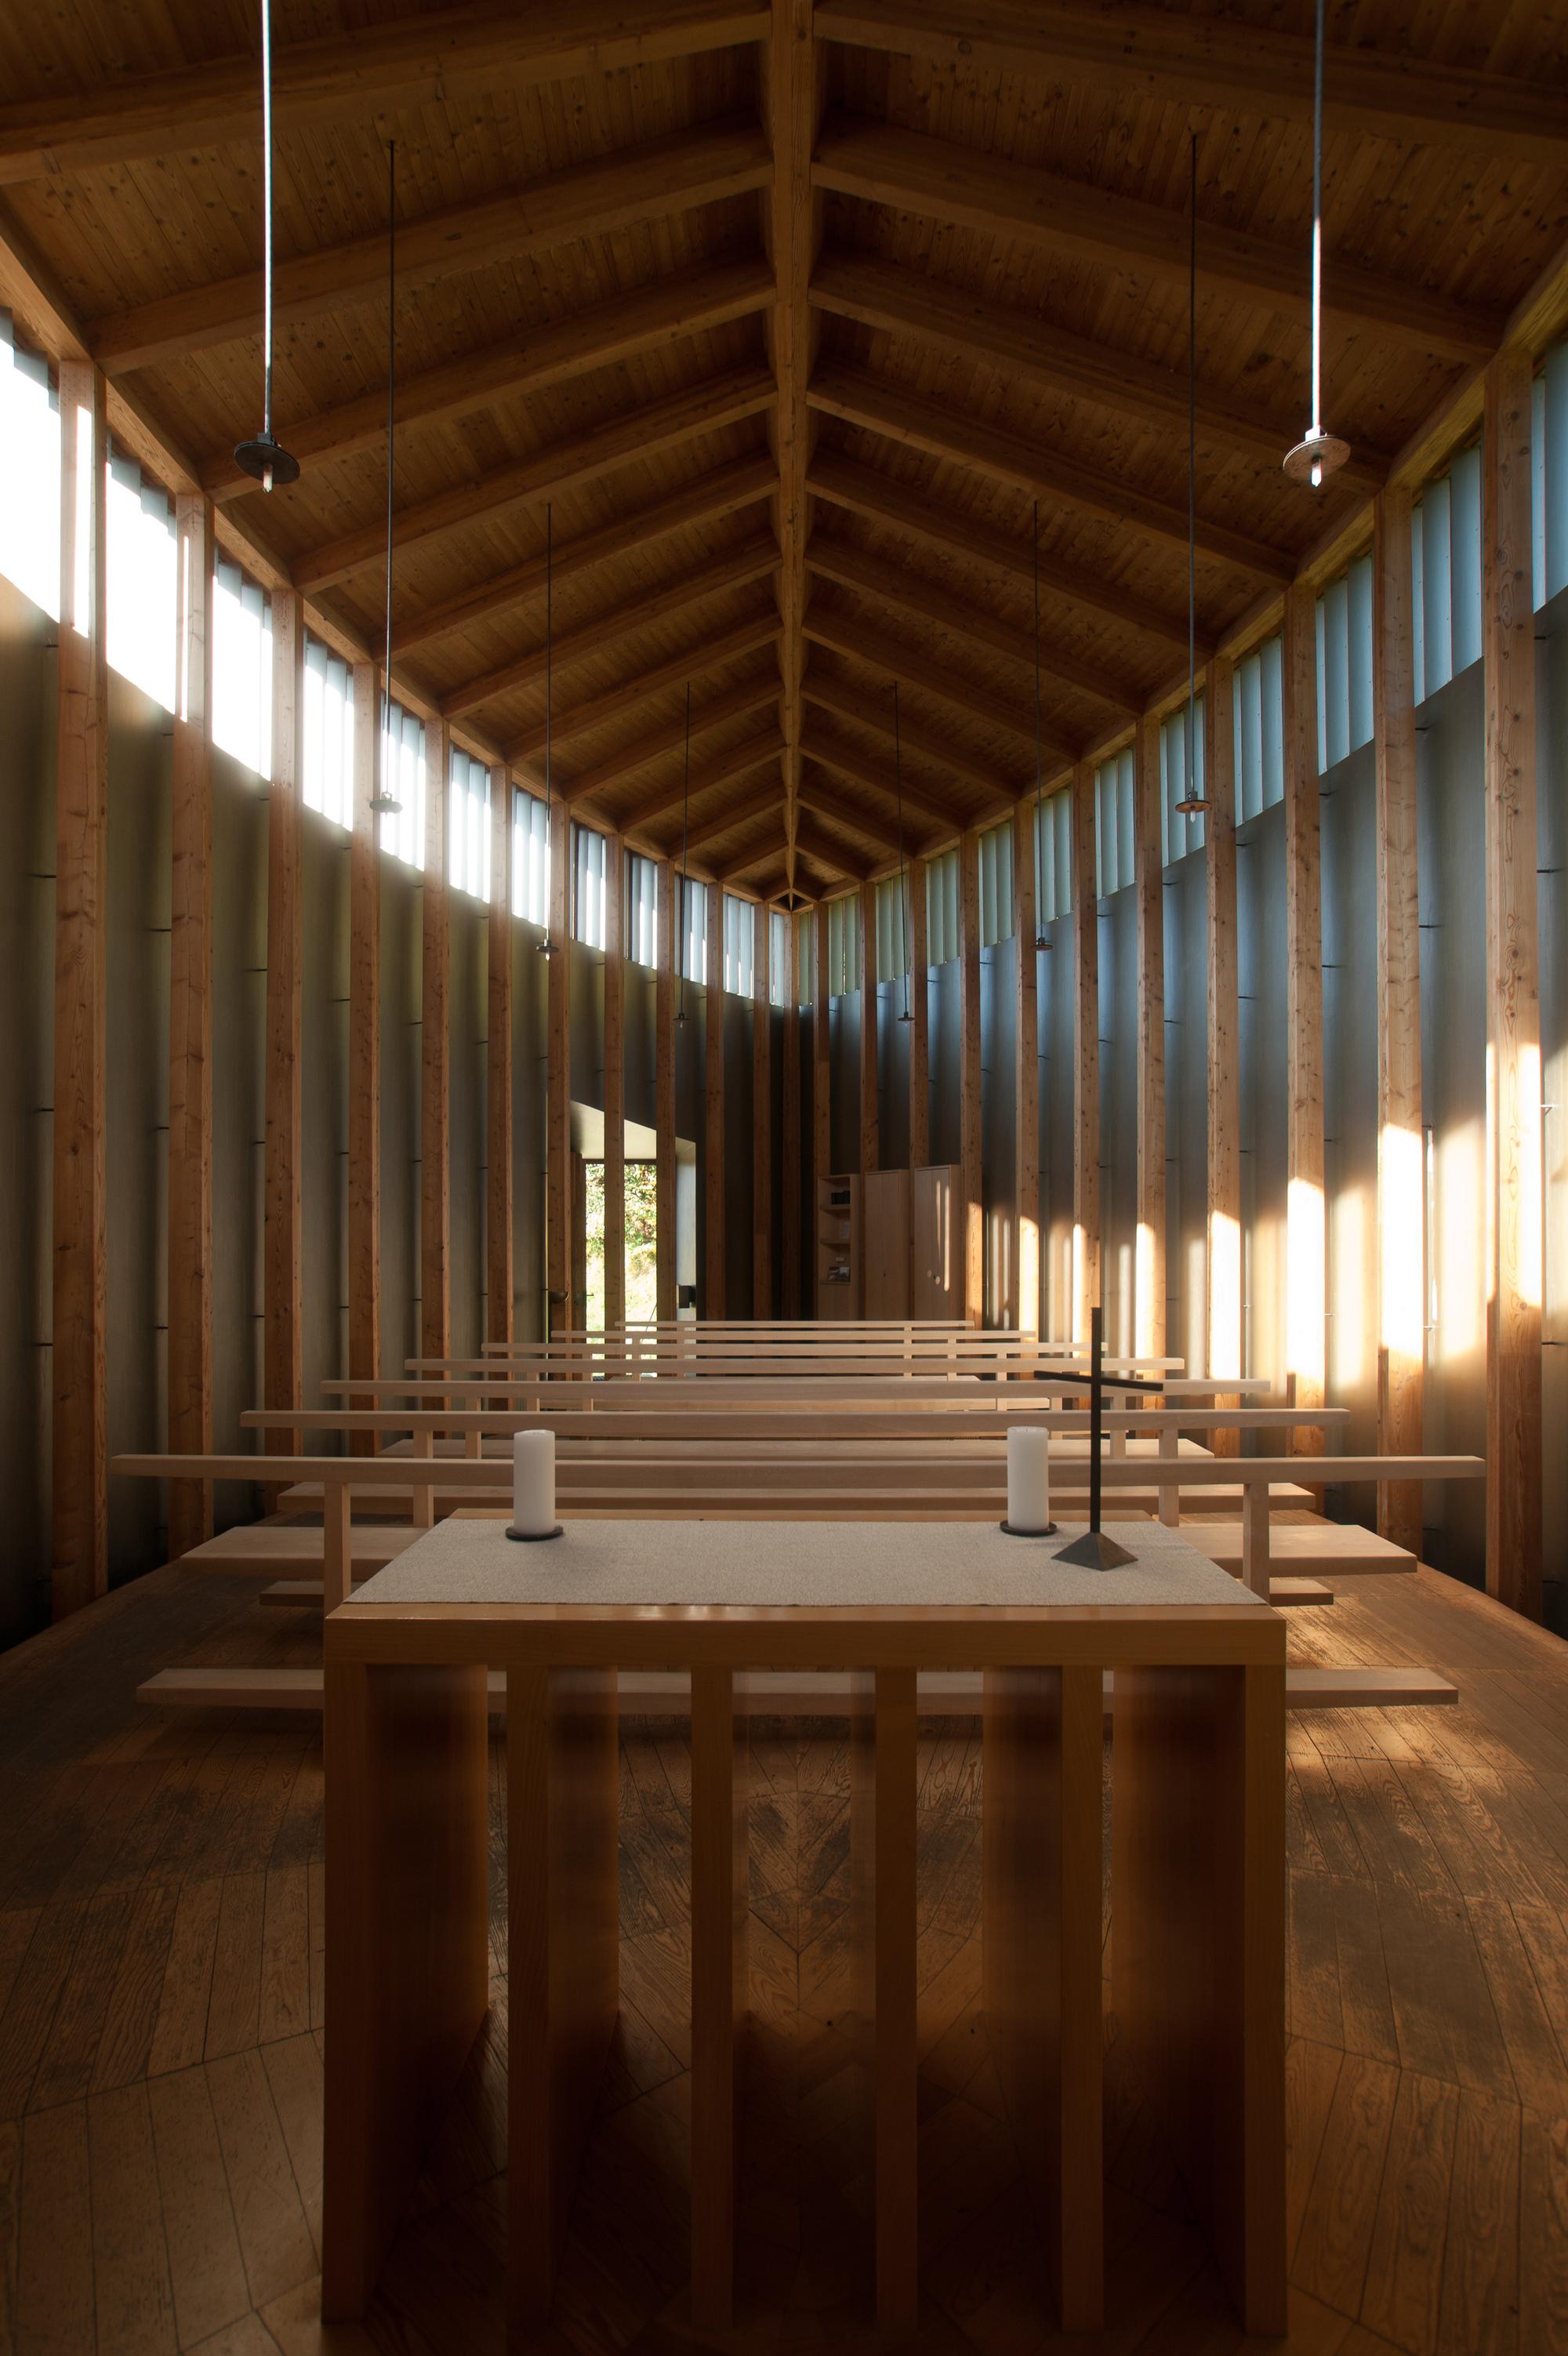 52153aaee8e44e4ee3000059_ad-classics-saint-benedict-chapel-peter-zumthor_untitled_6813541750_o.jpg